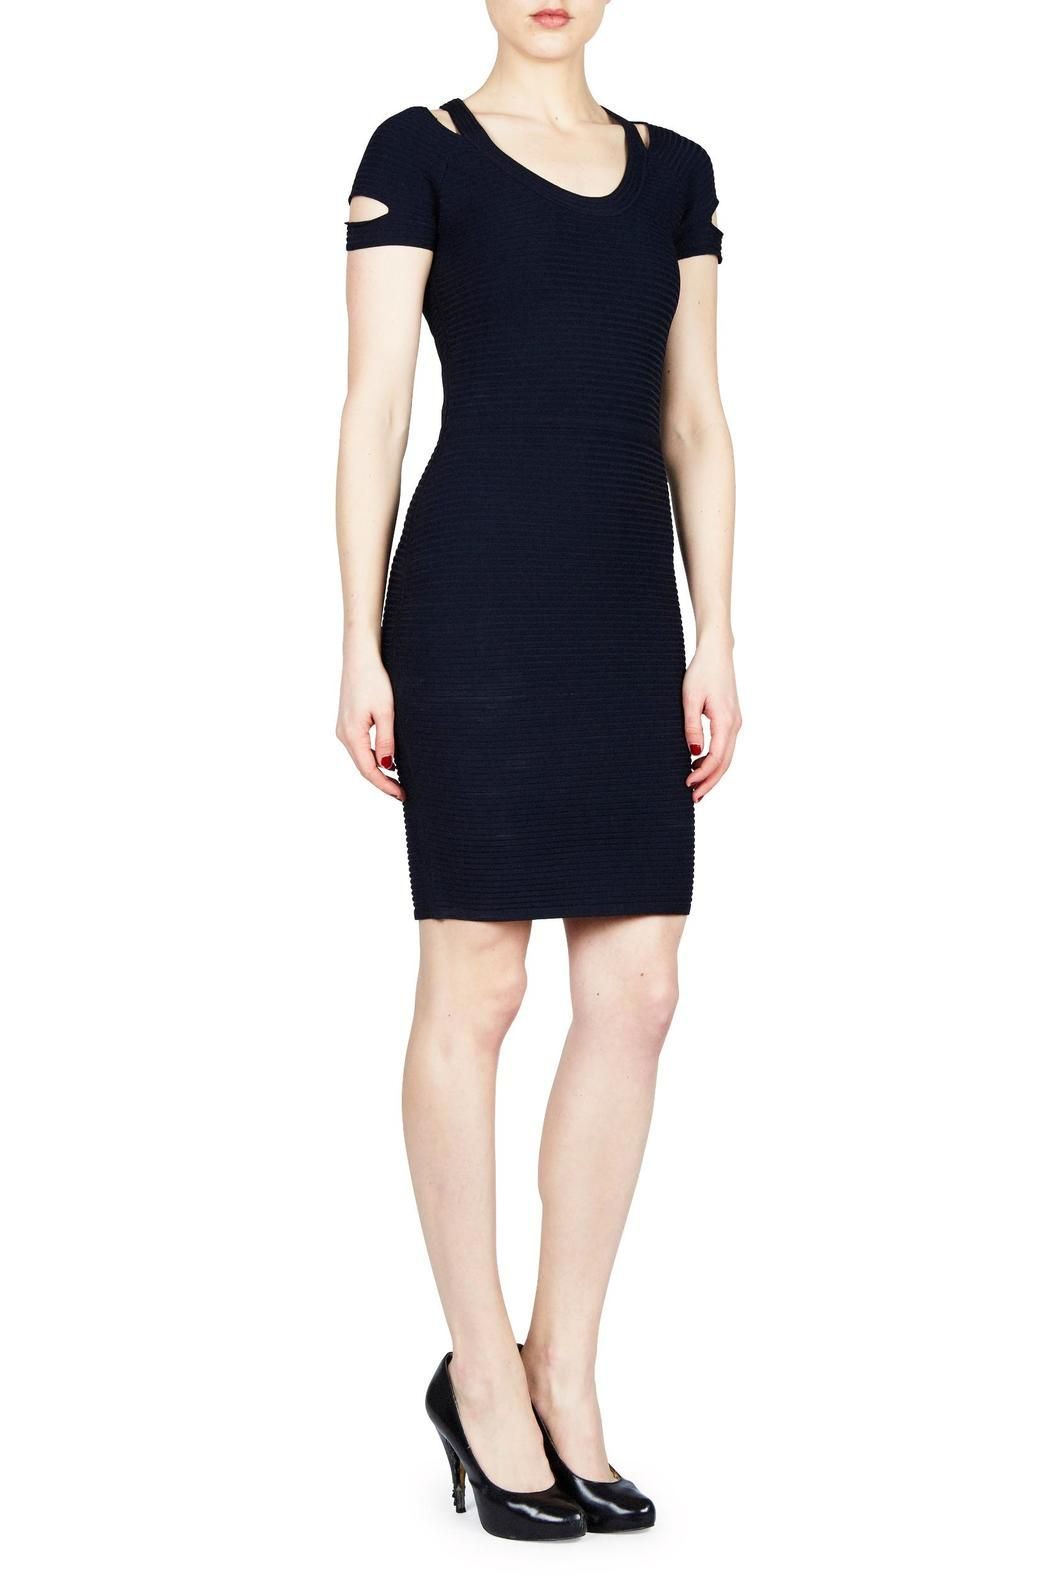 DRESSES - Short dresses Bailey 44 CS1ETs9